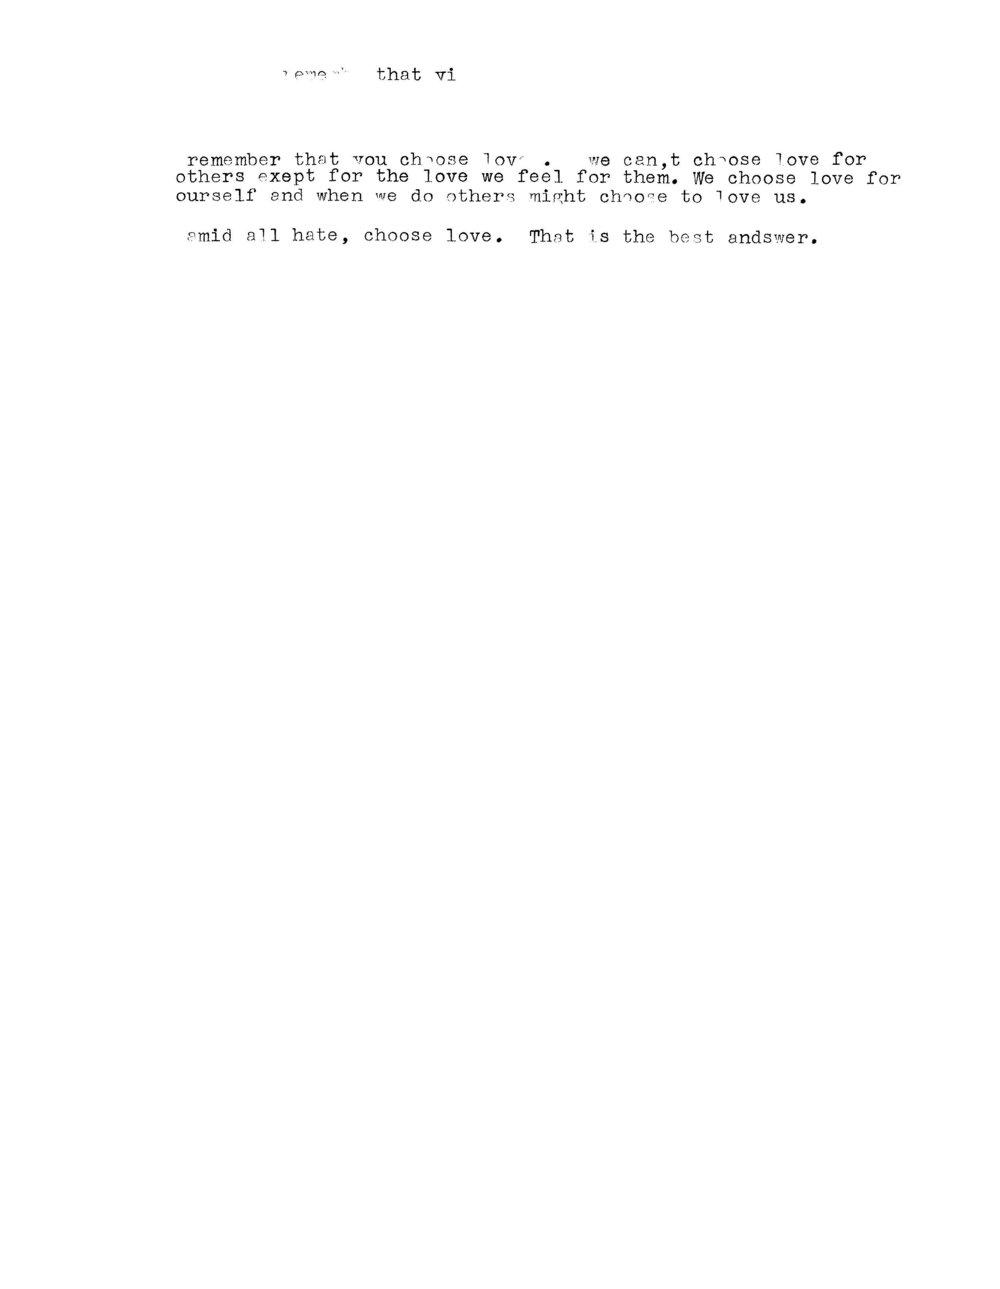 DOC030818-03082018095033_Page_04_Image_0001.jpg